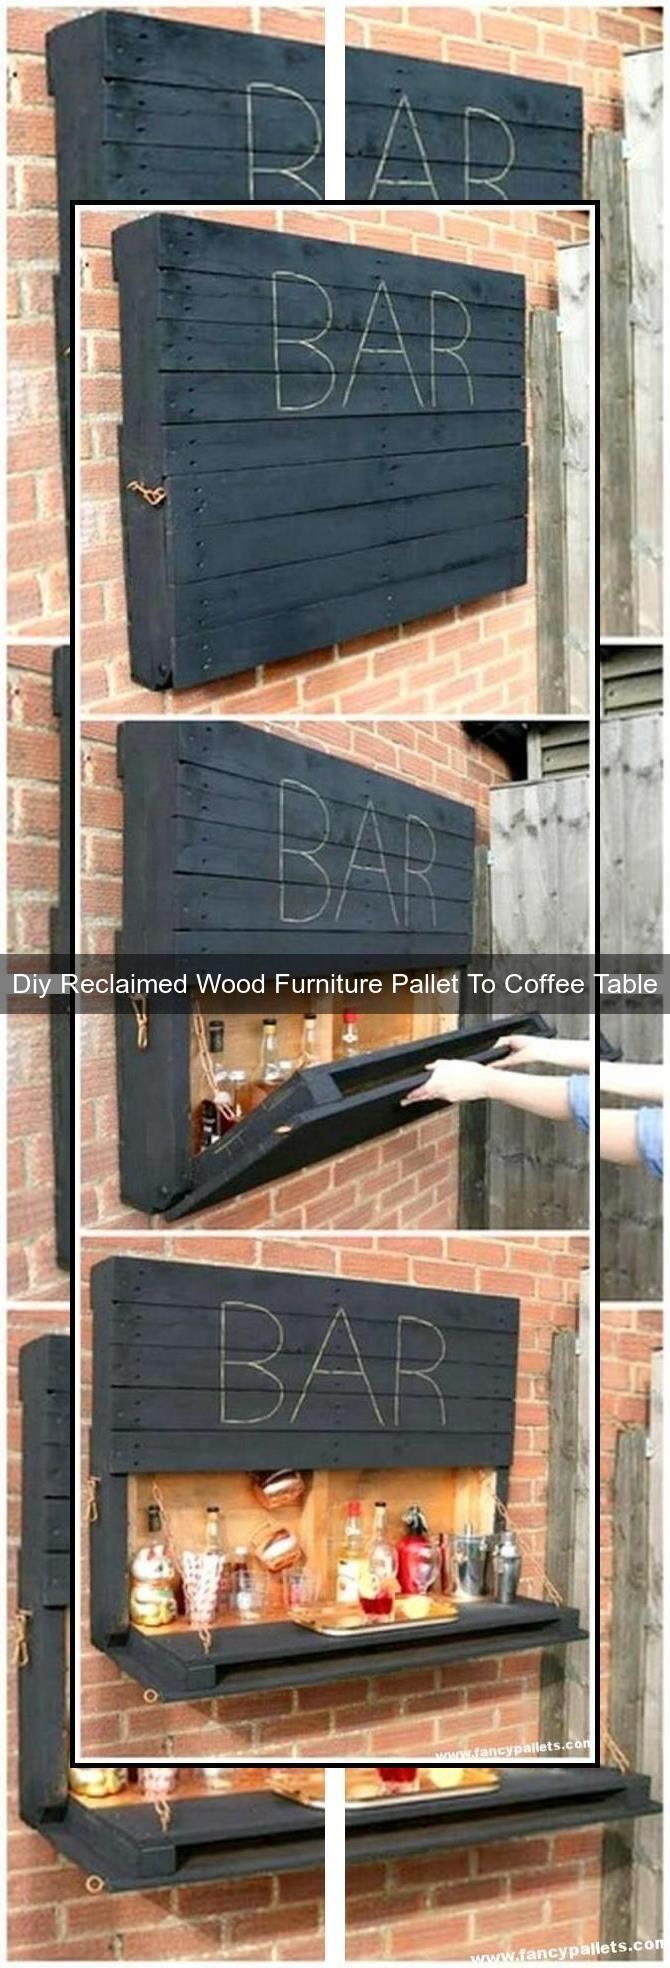 Wood Pallet Ideas | Uk Pallet Size | Pictures Of Pallet ...